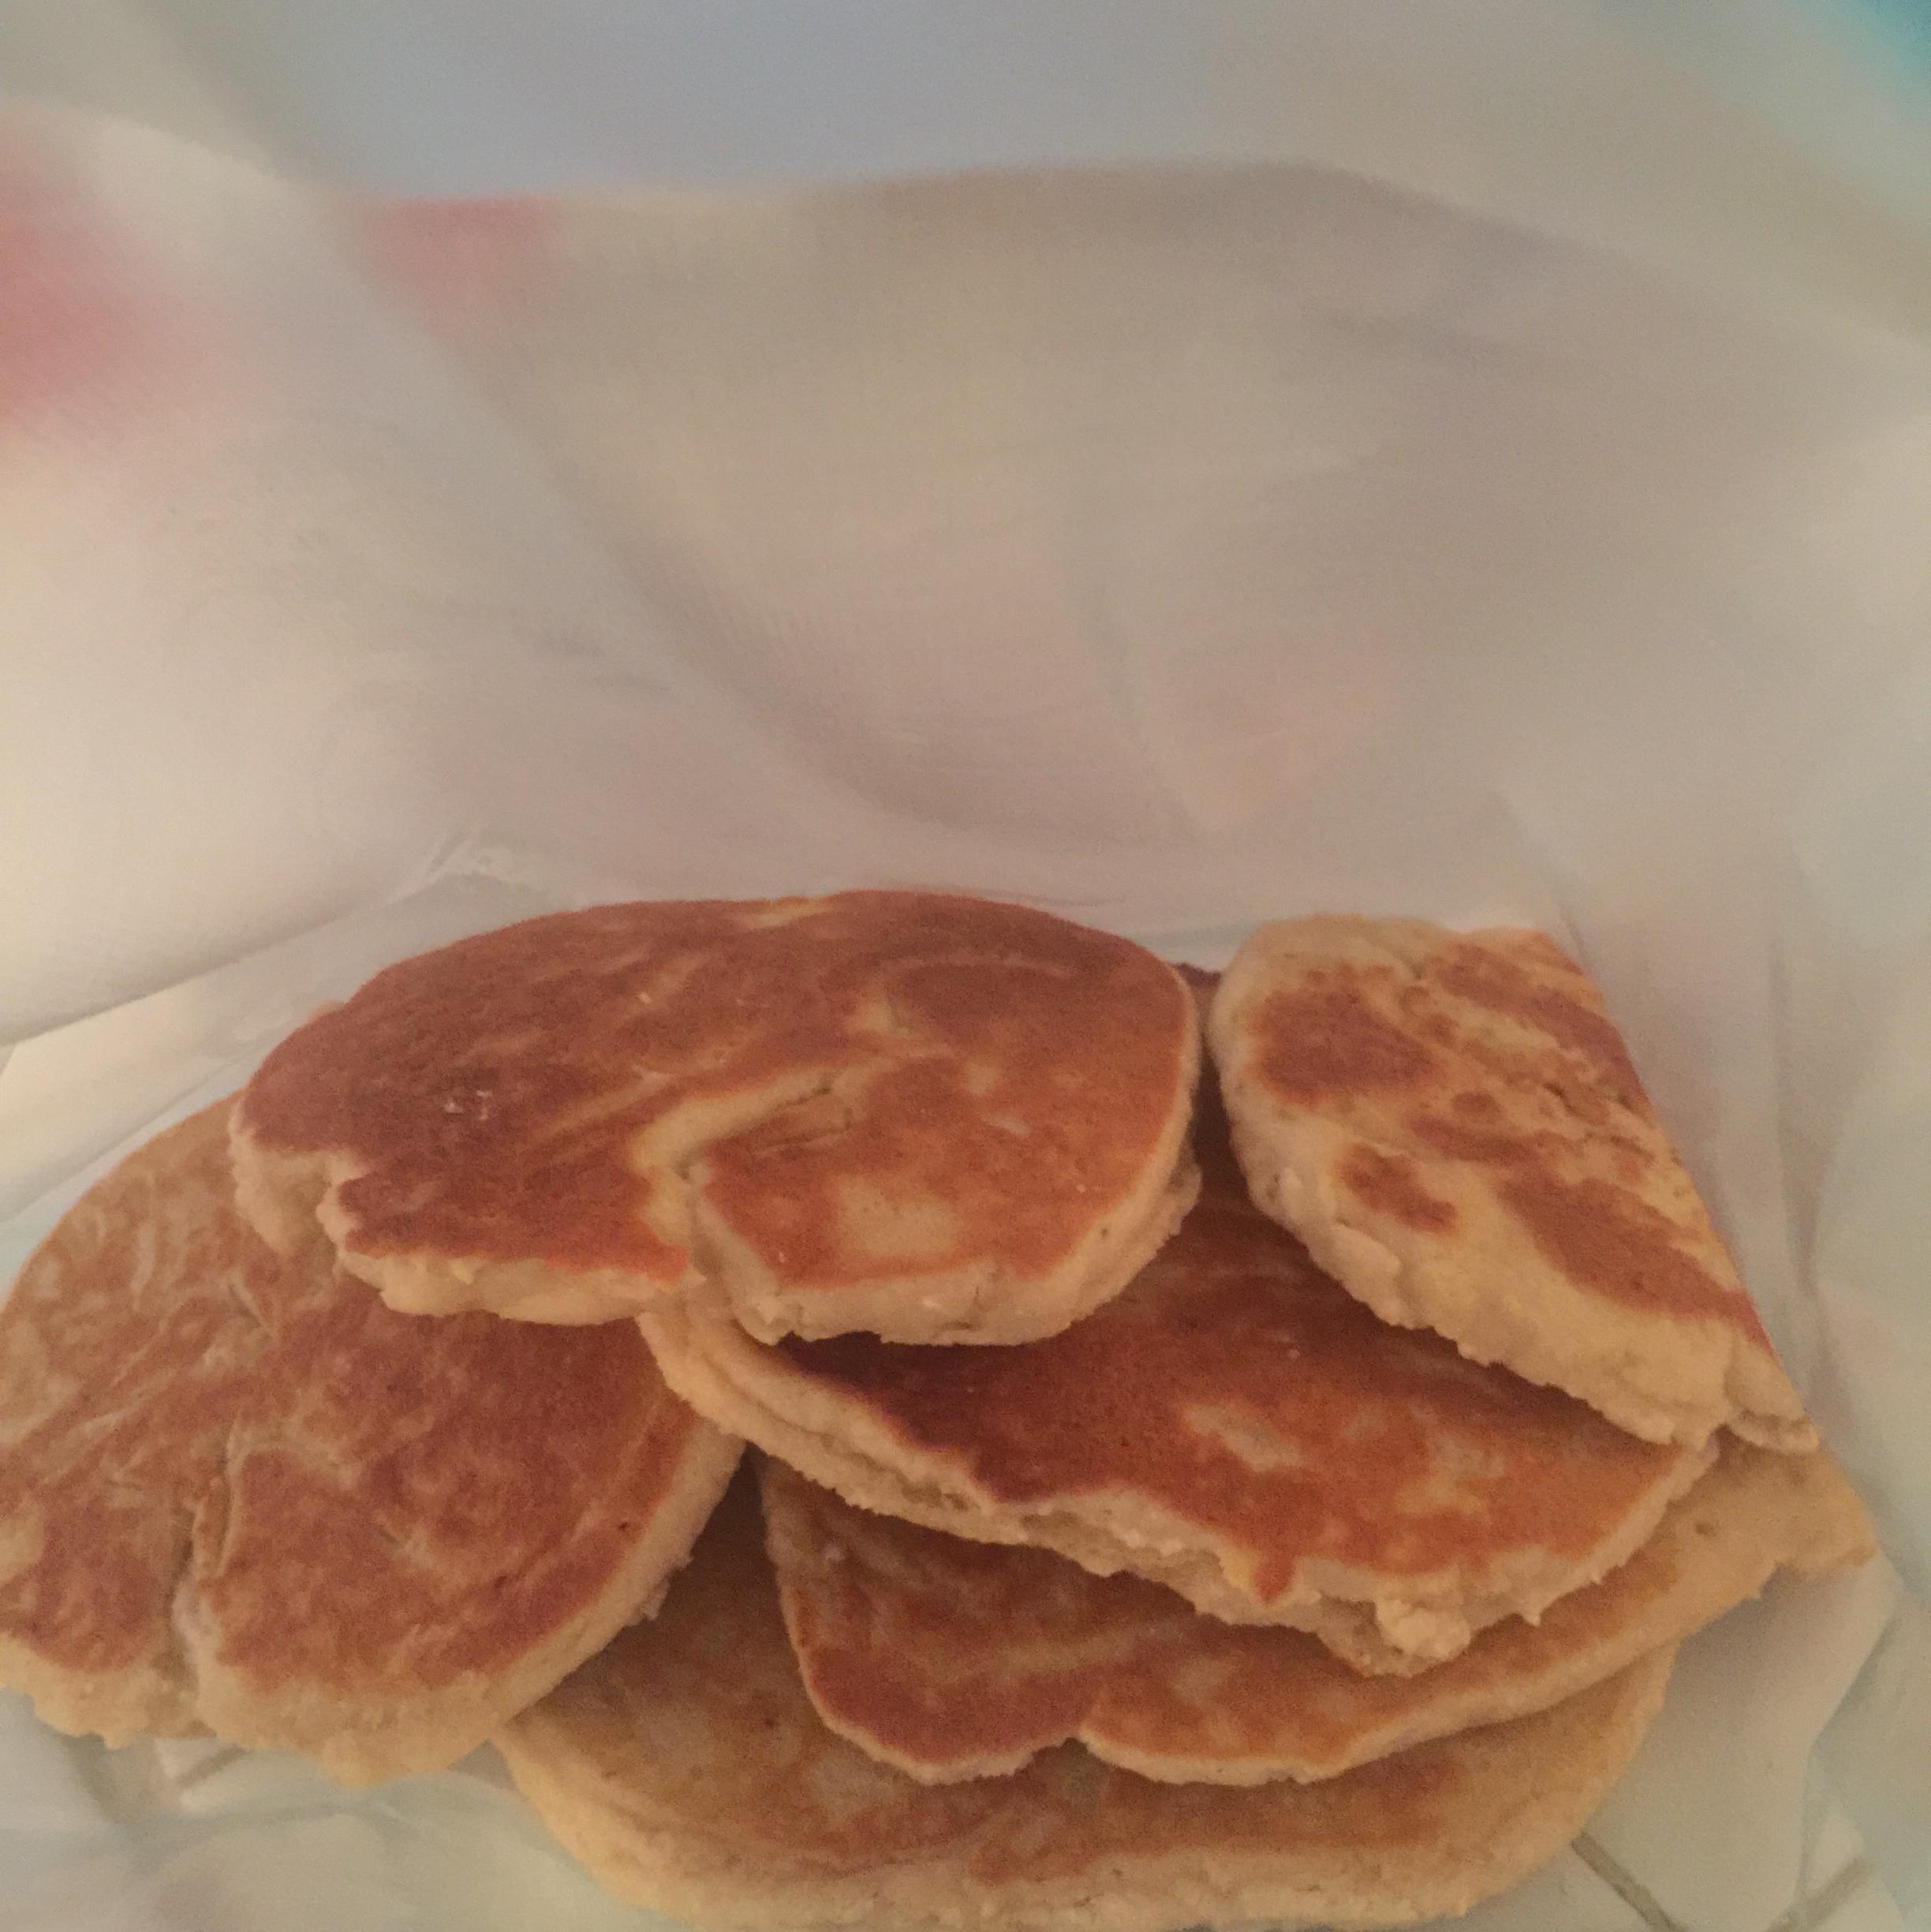 Almond Sandwich Bread Donna Phillips-Lancaster